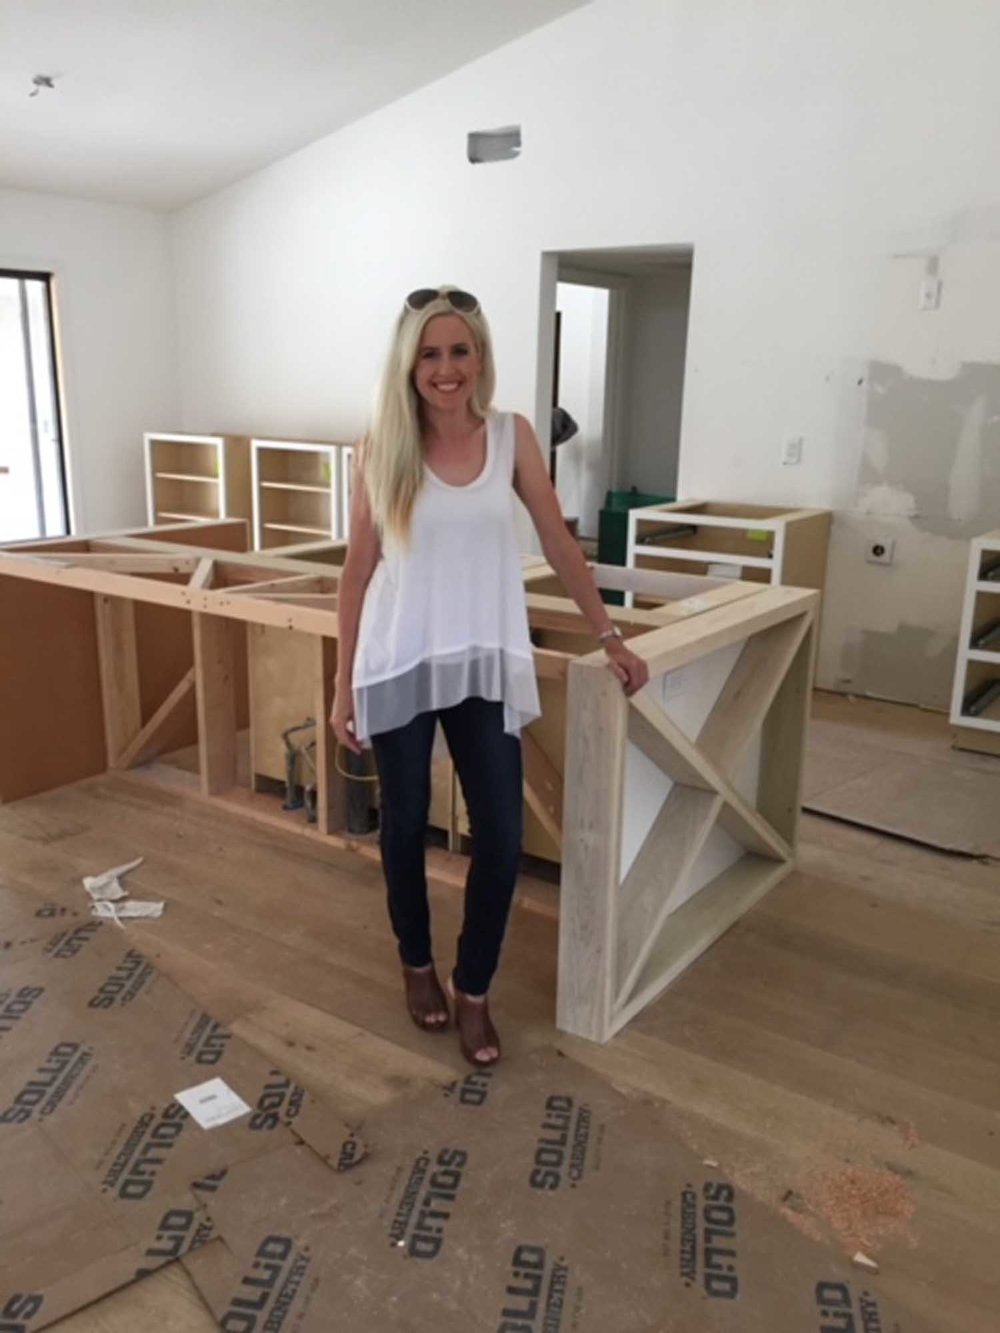 Woman standing in under renovation room